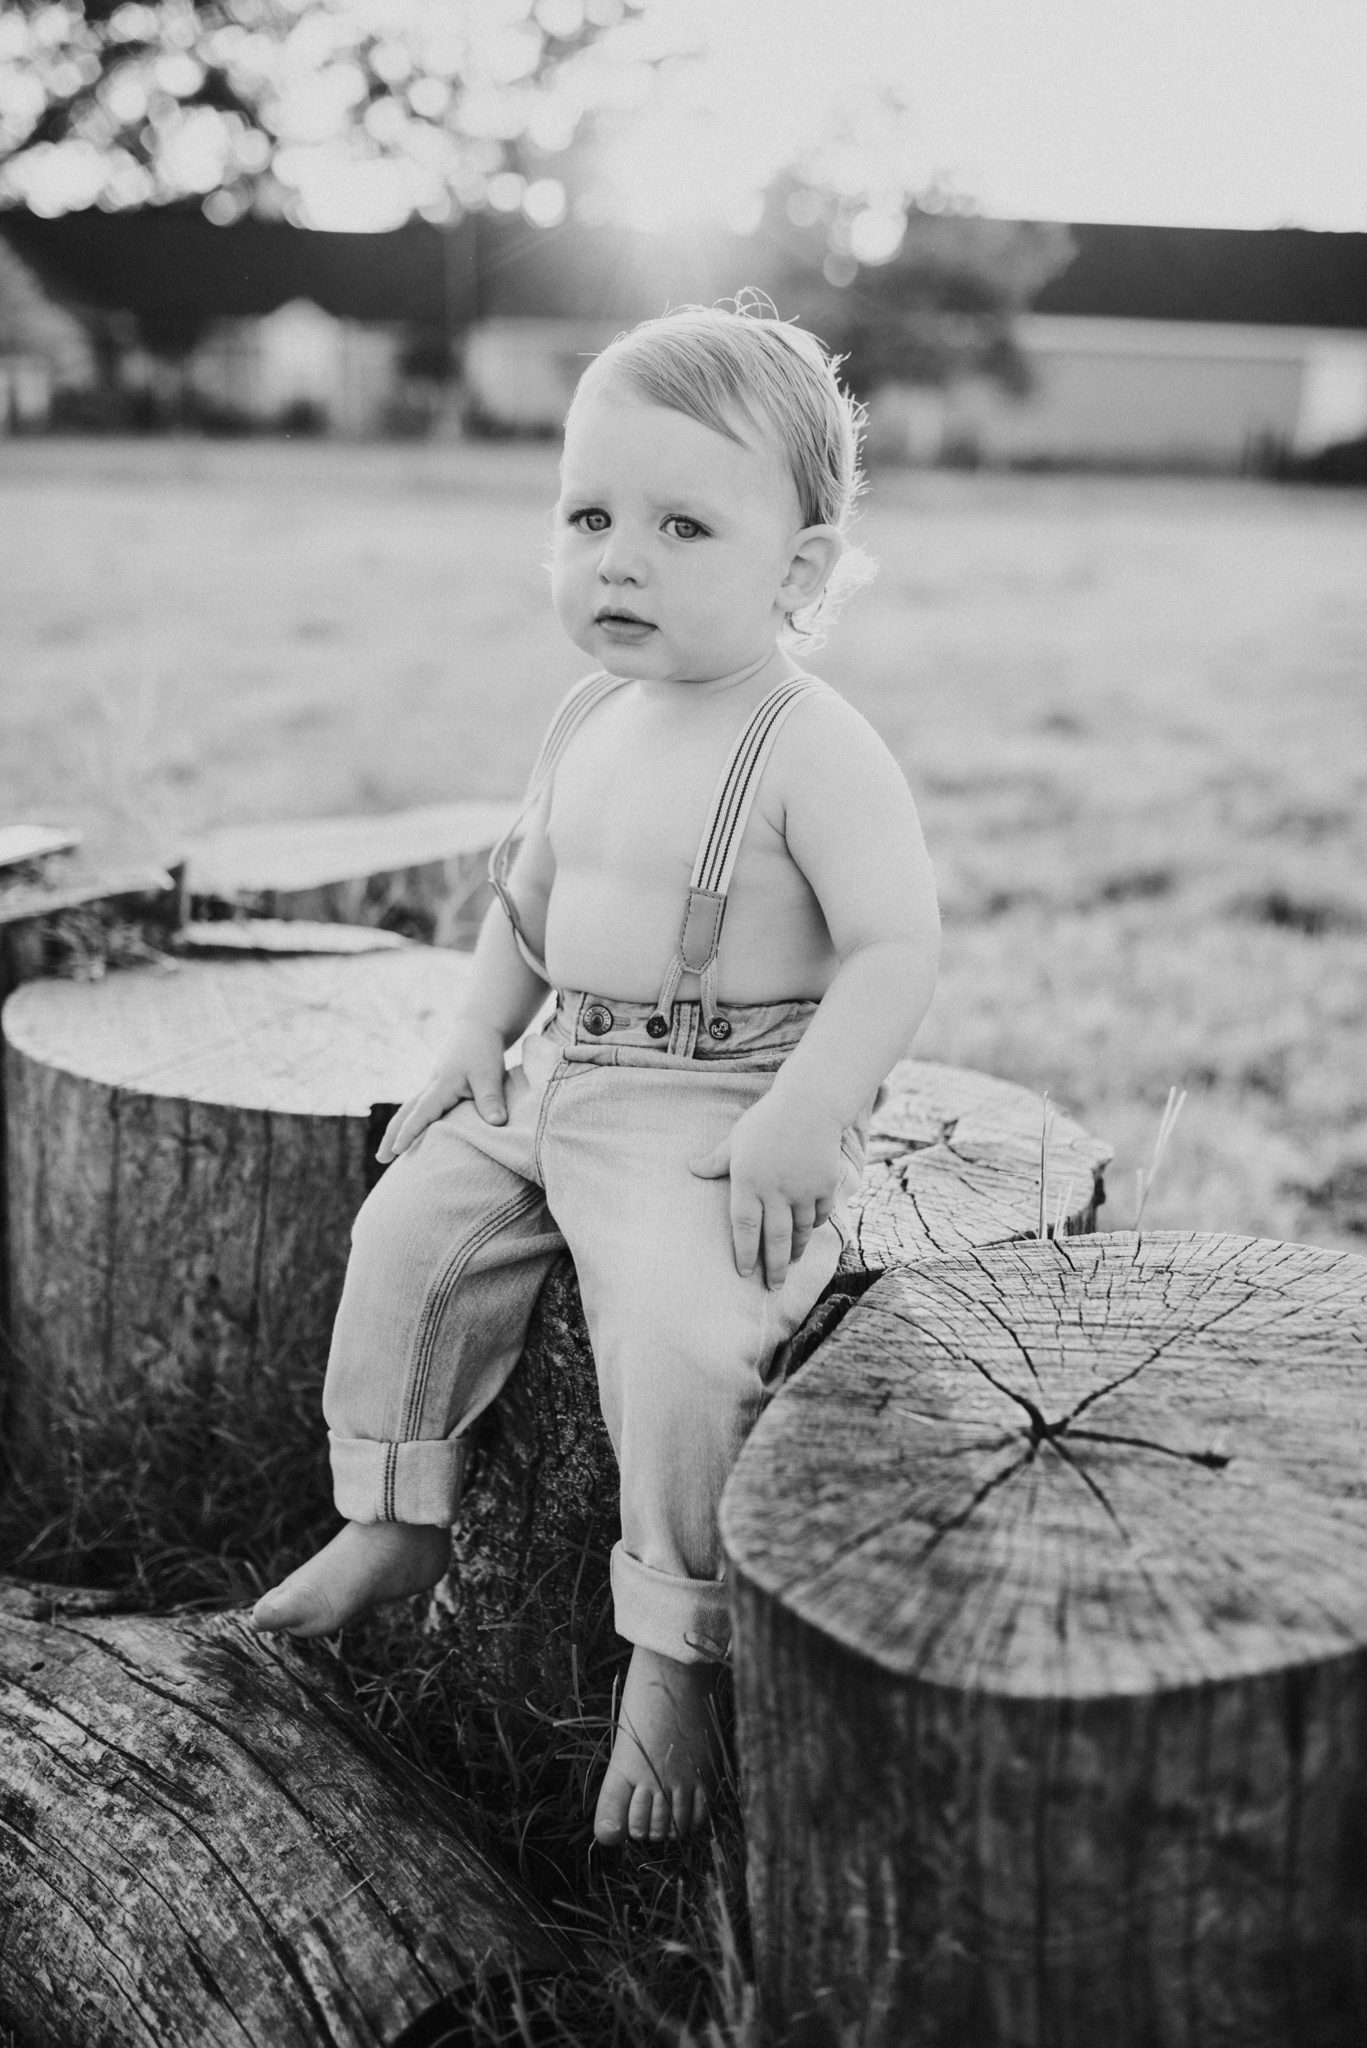 Graham-18 months-44.jpg